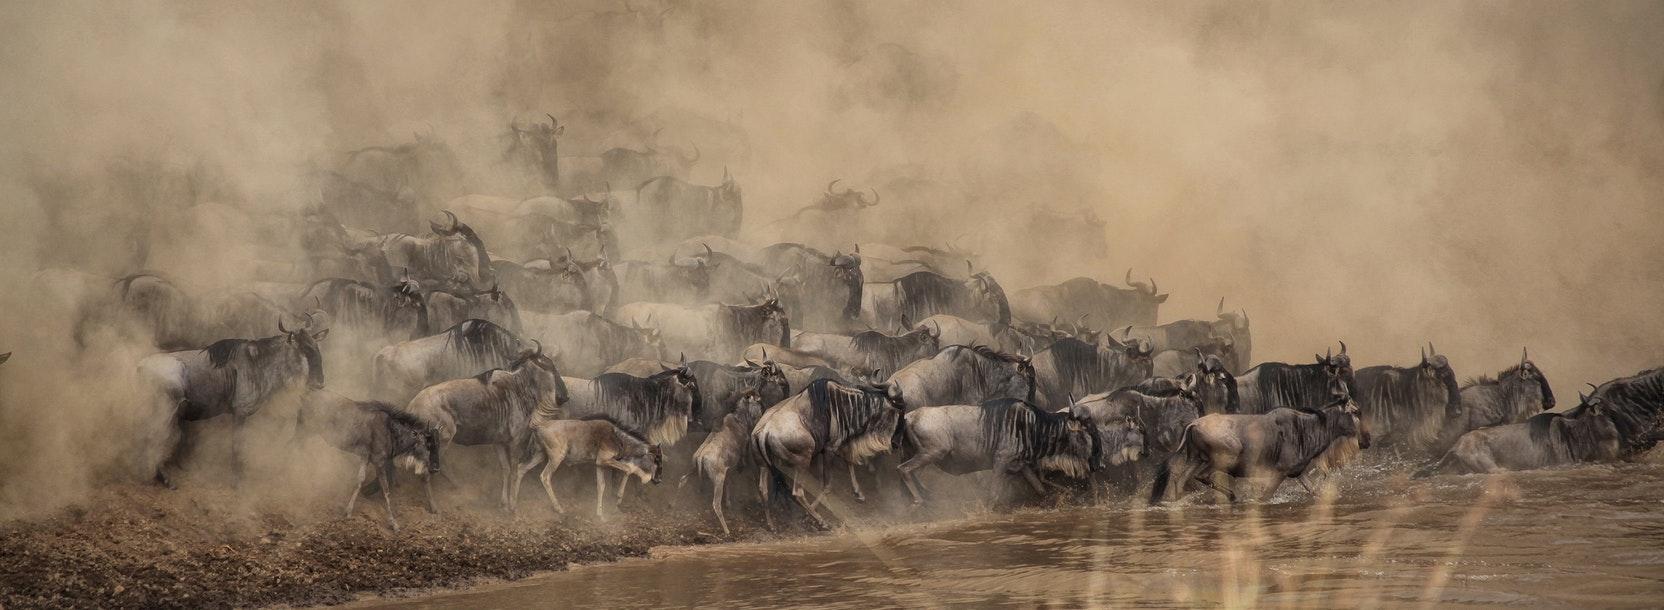 Kenya wildebeest 3.jpg